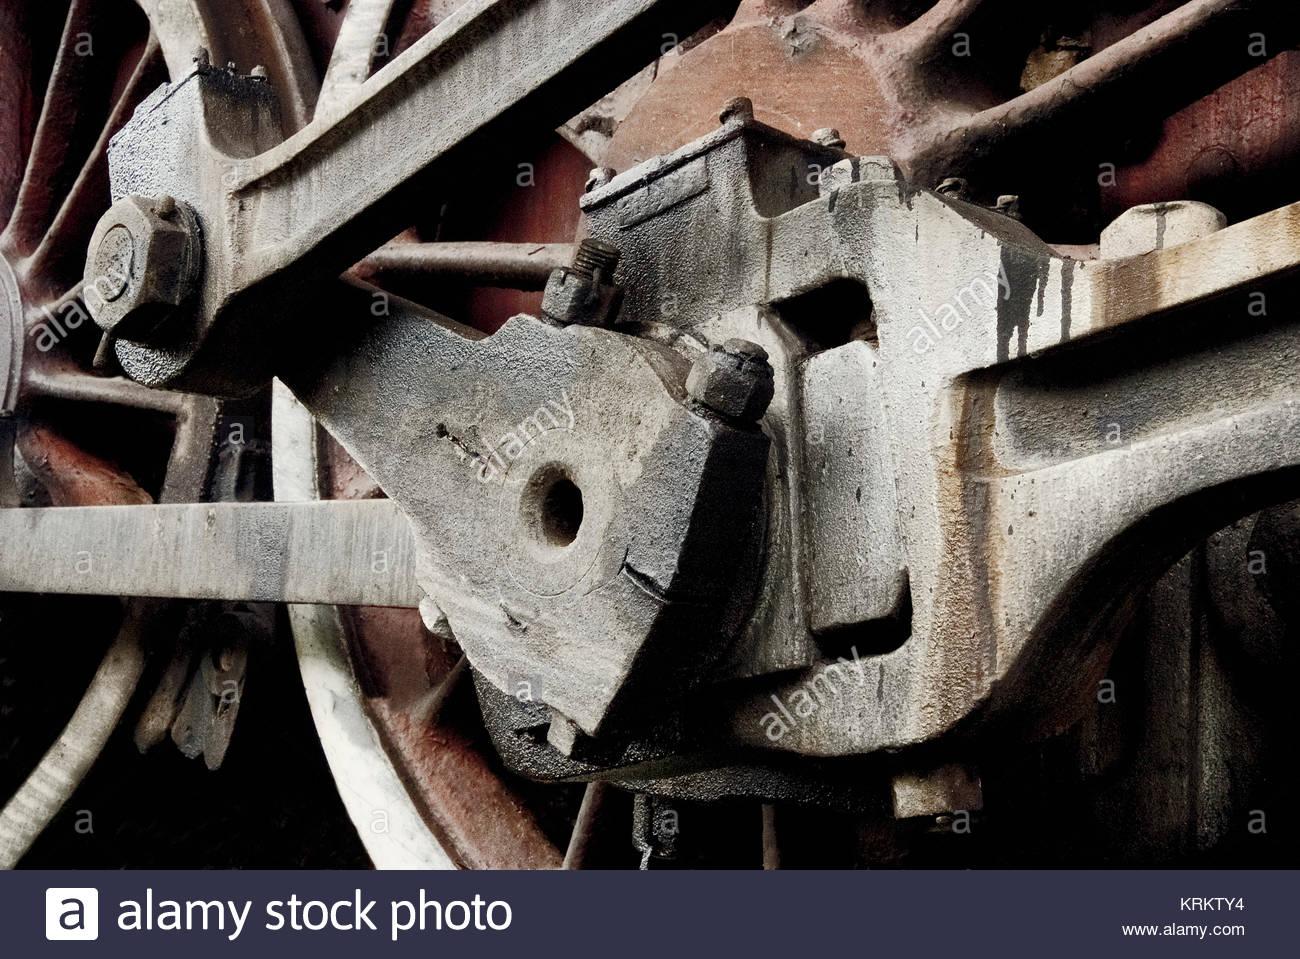 Close up details of a retro train wheel. Stock Photo